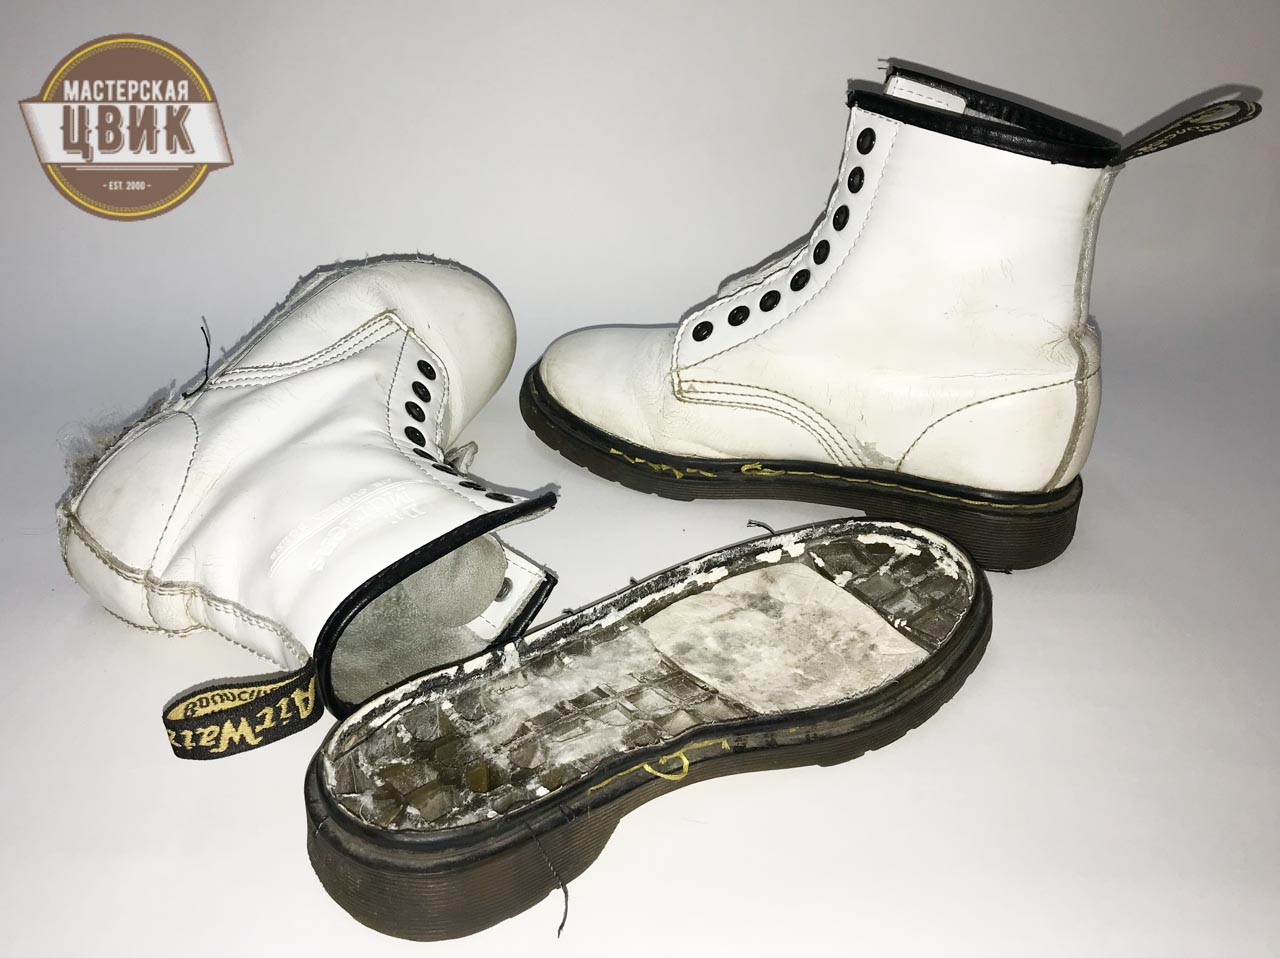 individualnyj-poshiv-obuvi-minsk-52 Индивидуальный пошив обуви